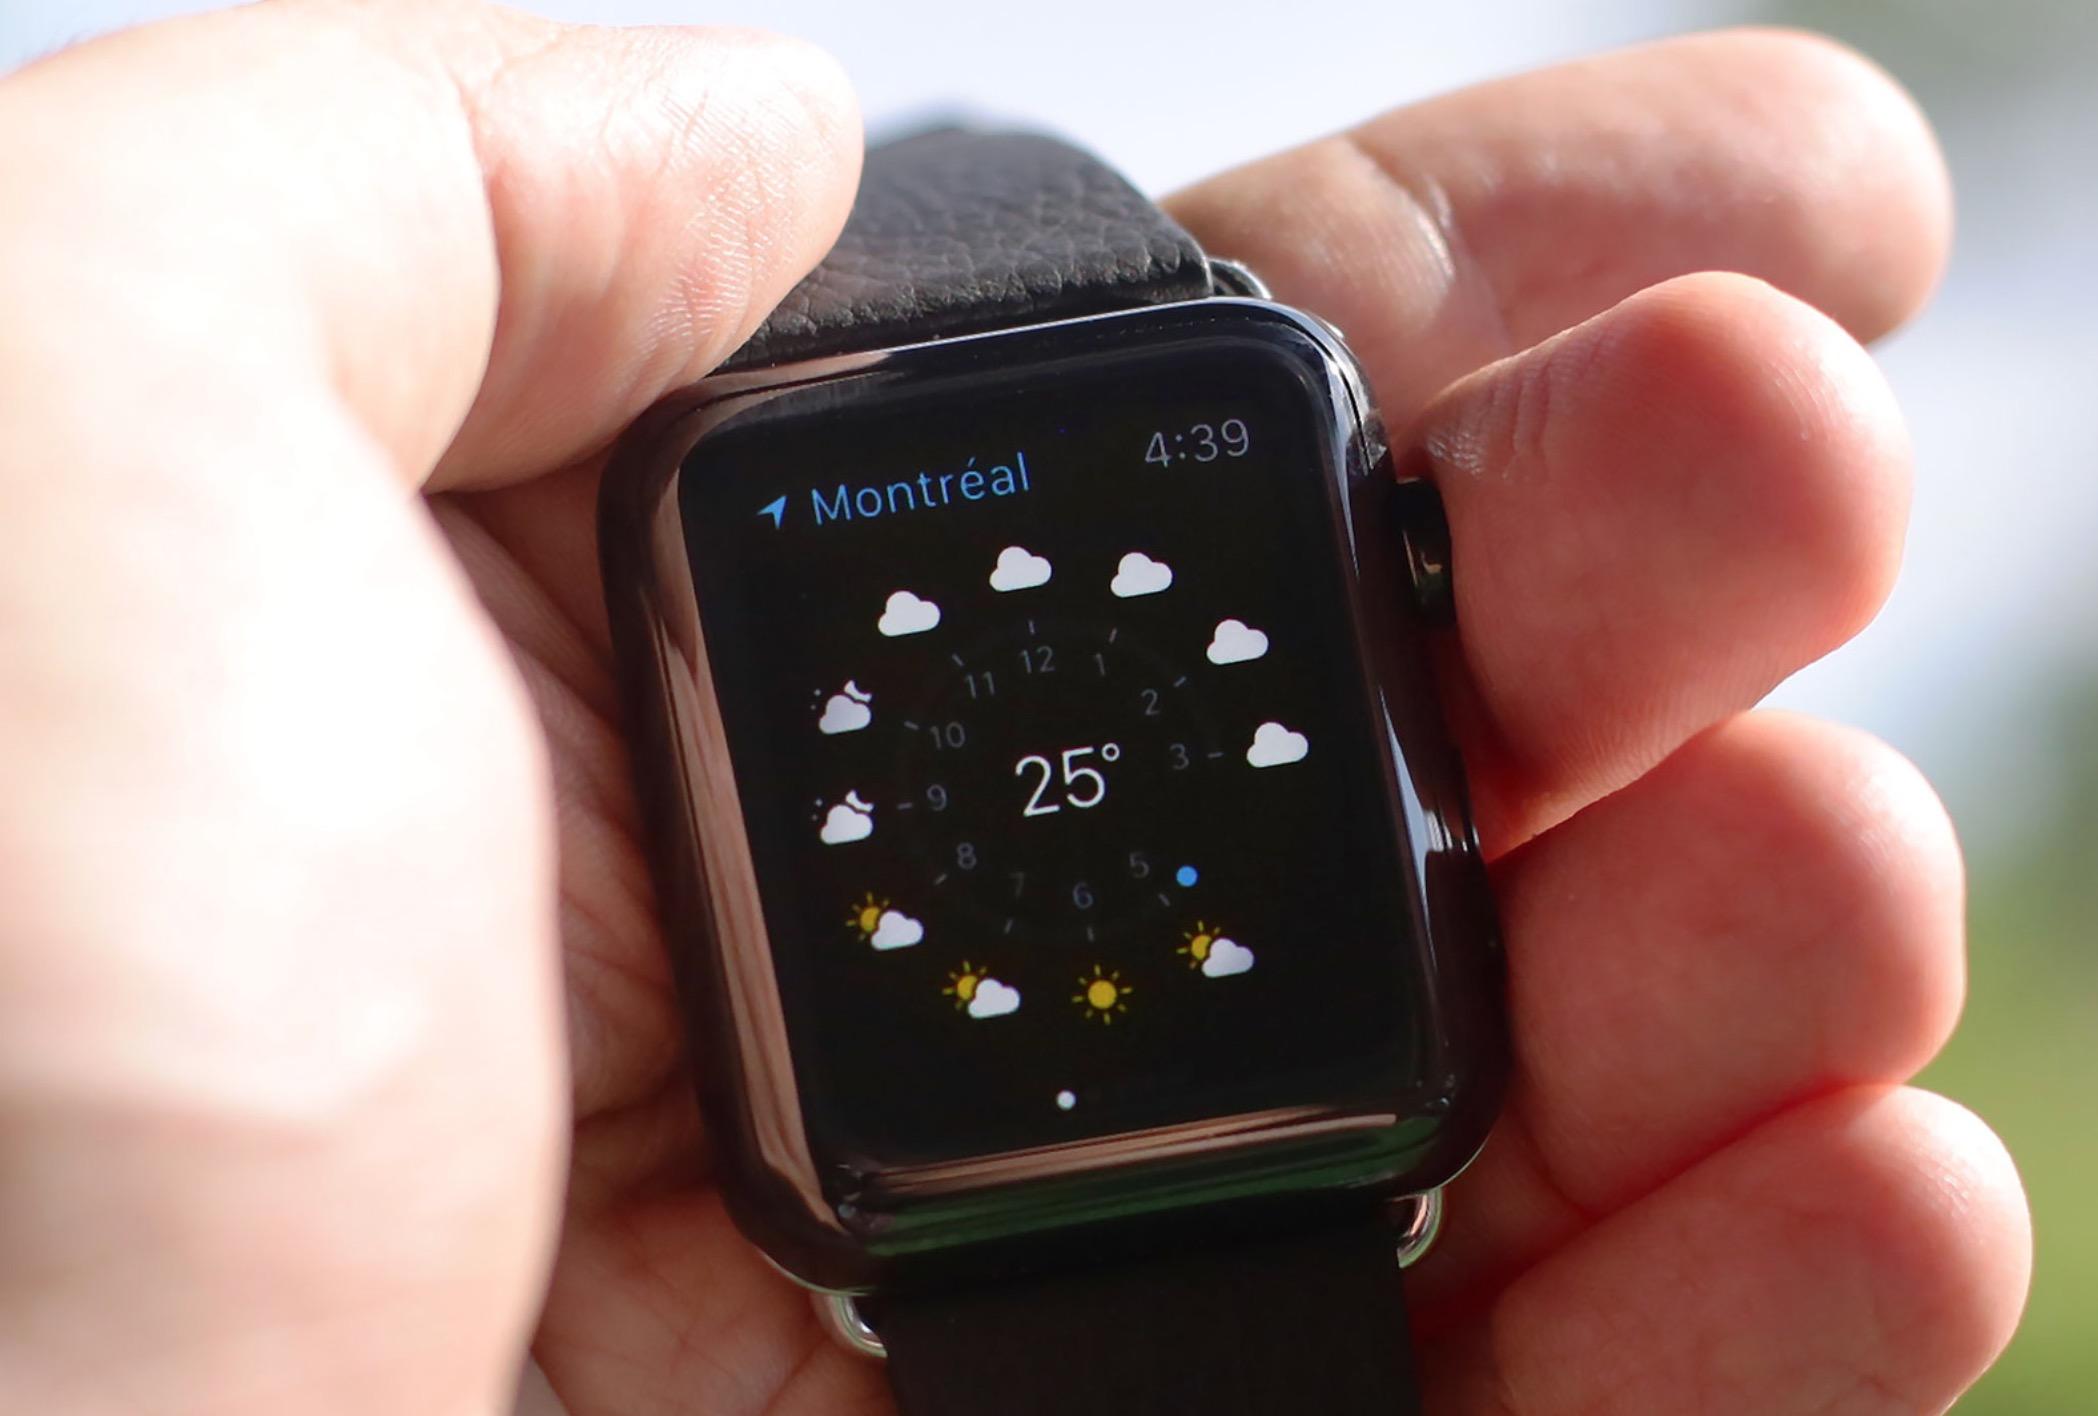 Meteo Apple Watch